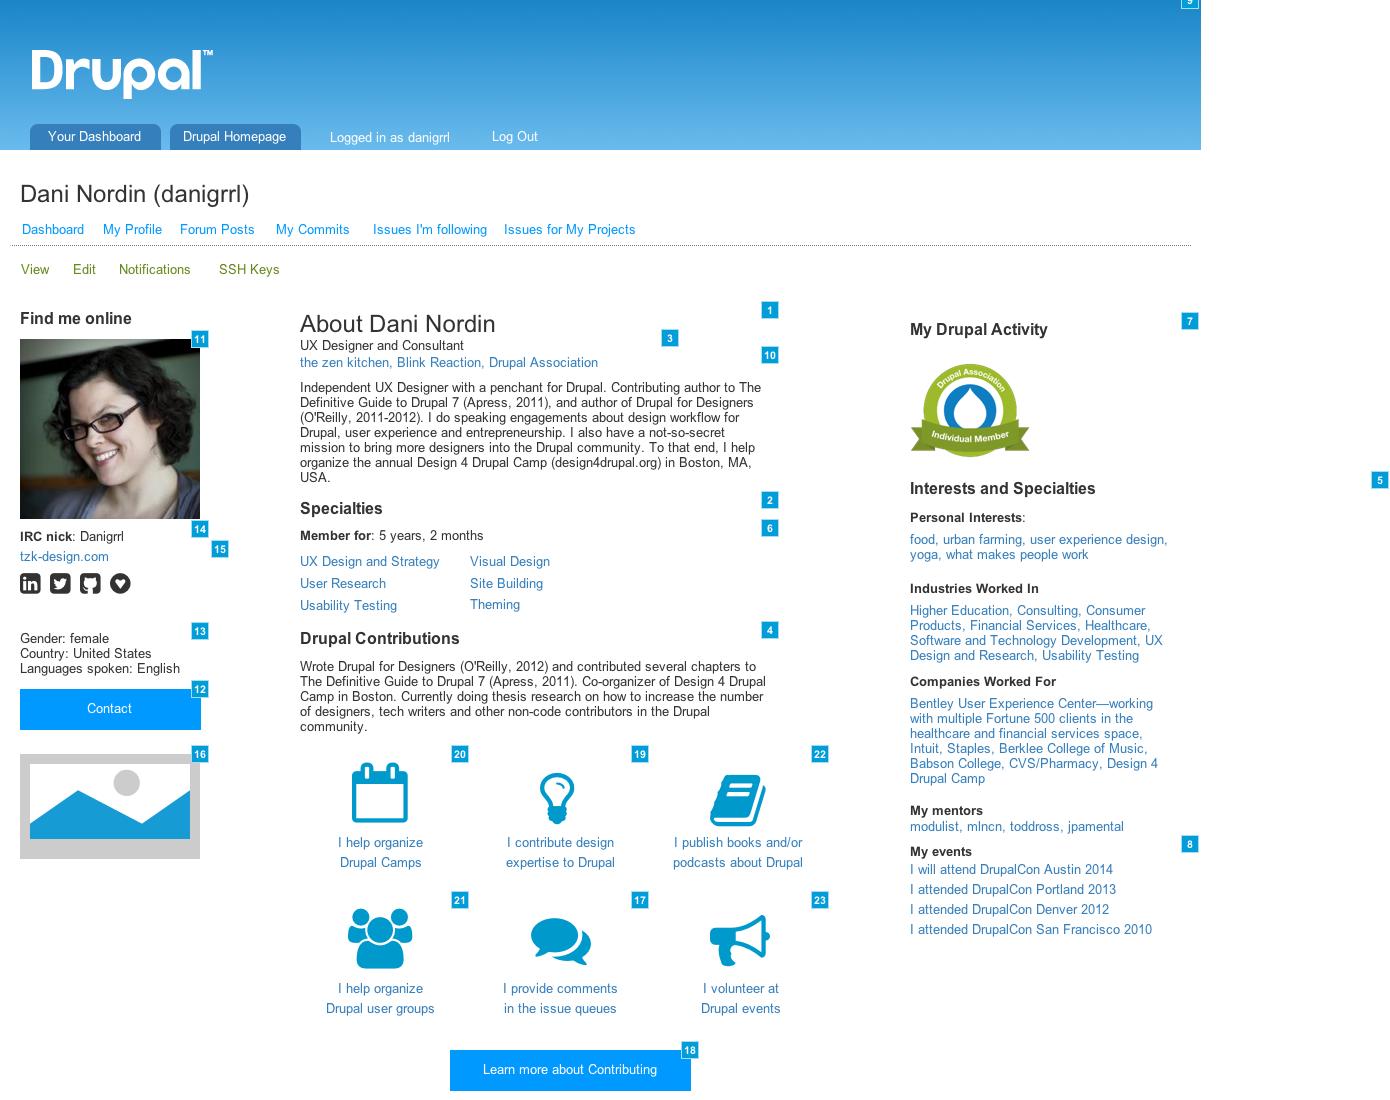 Make drupal user profiles more robust 2281763 drupal 7 profilenon codecontributorg xflitez Gallery